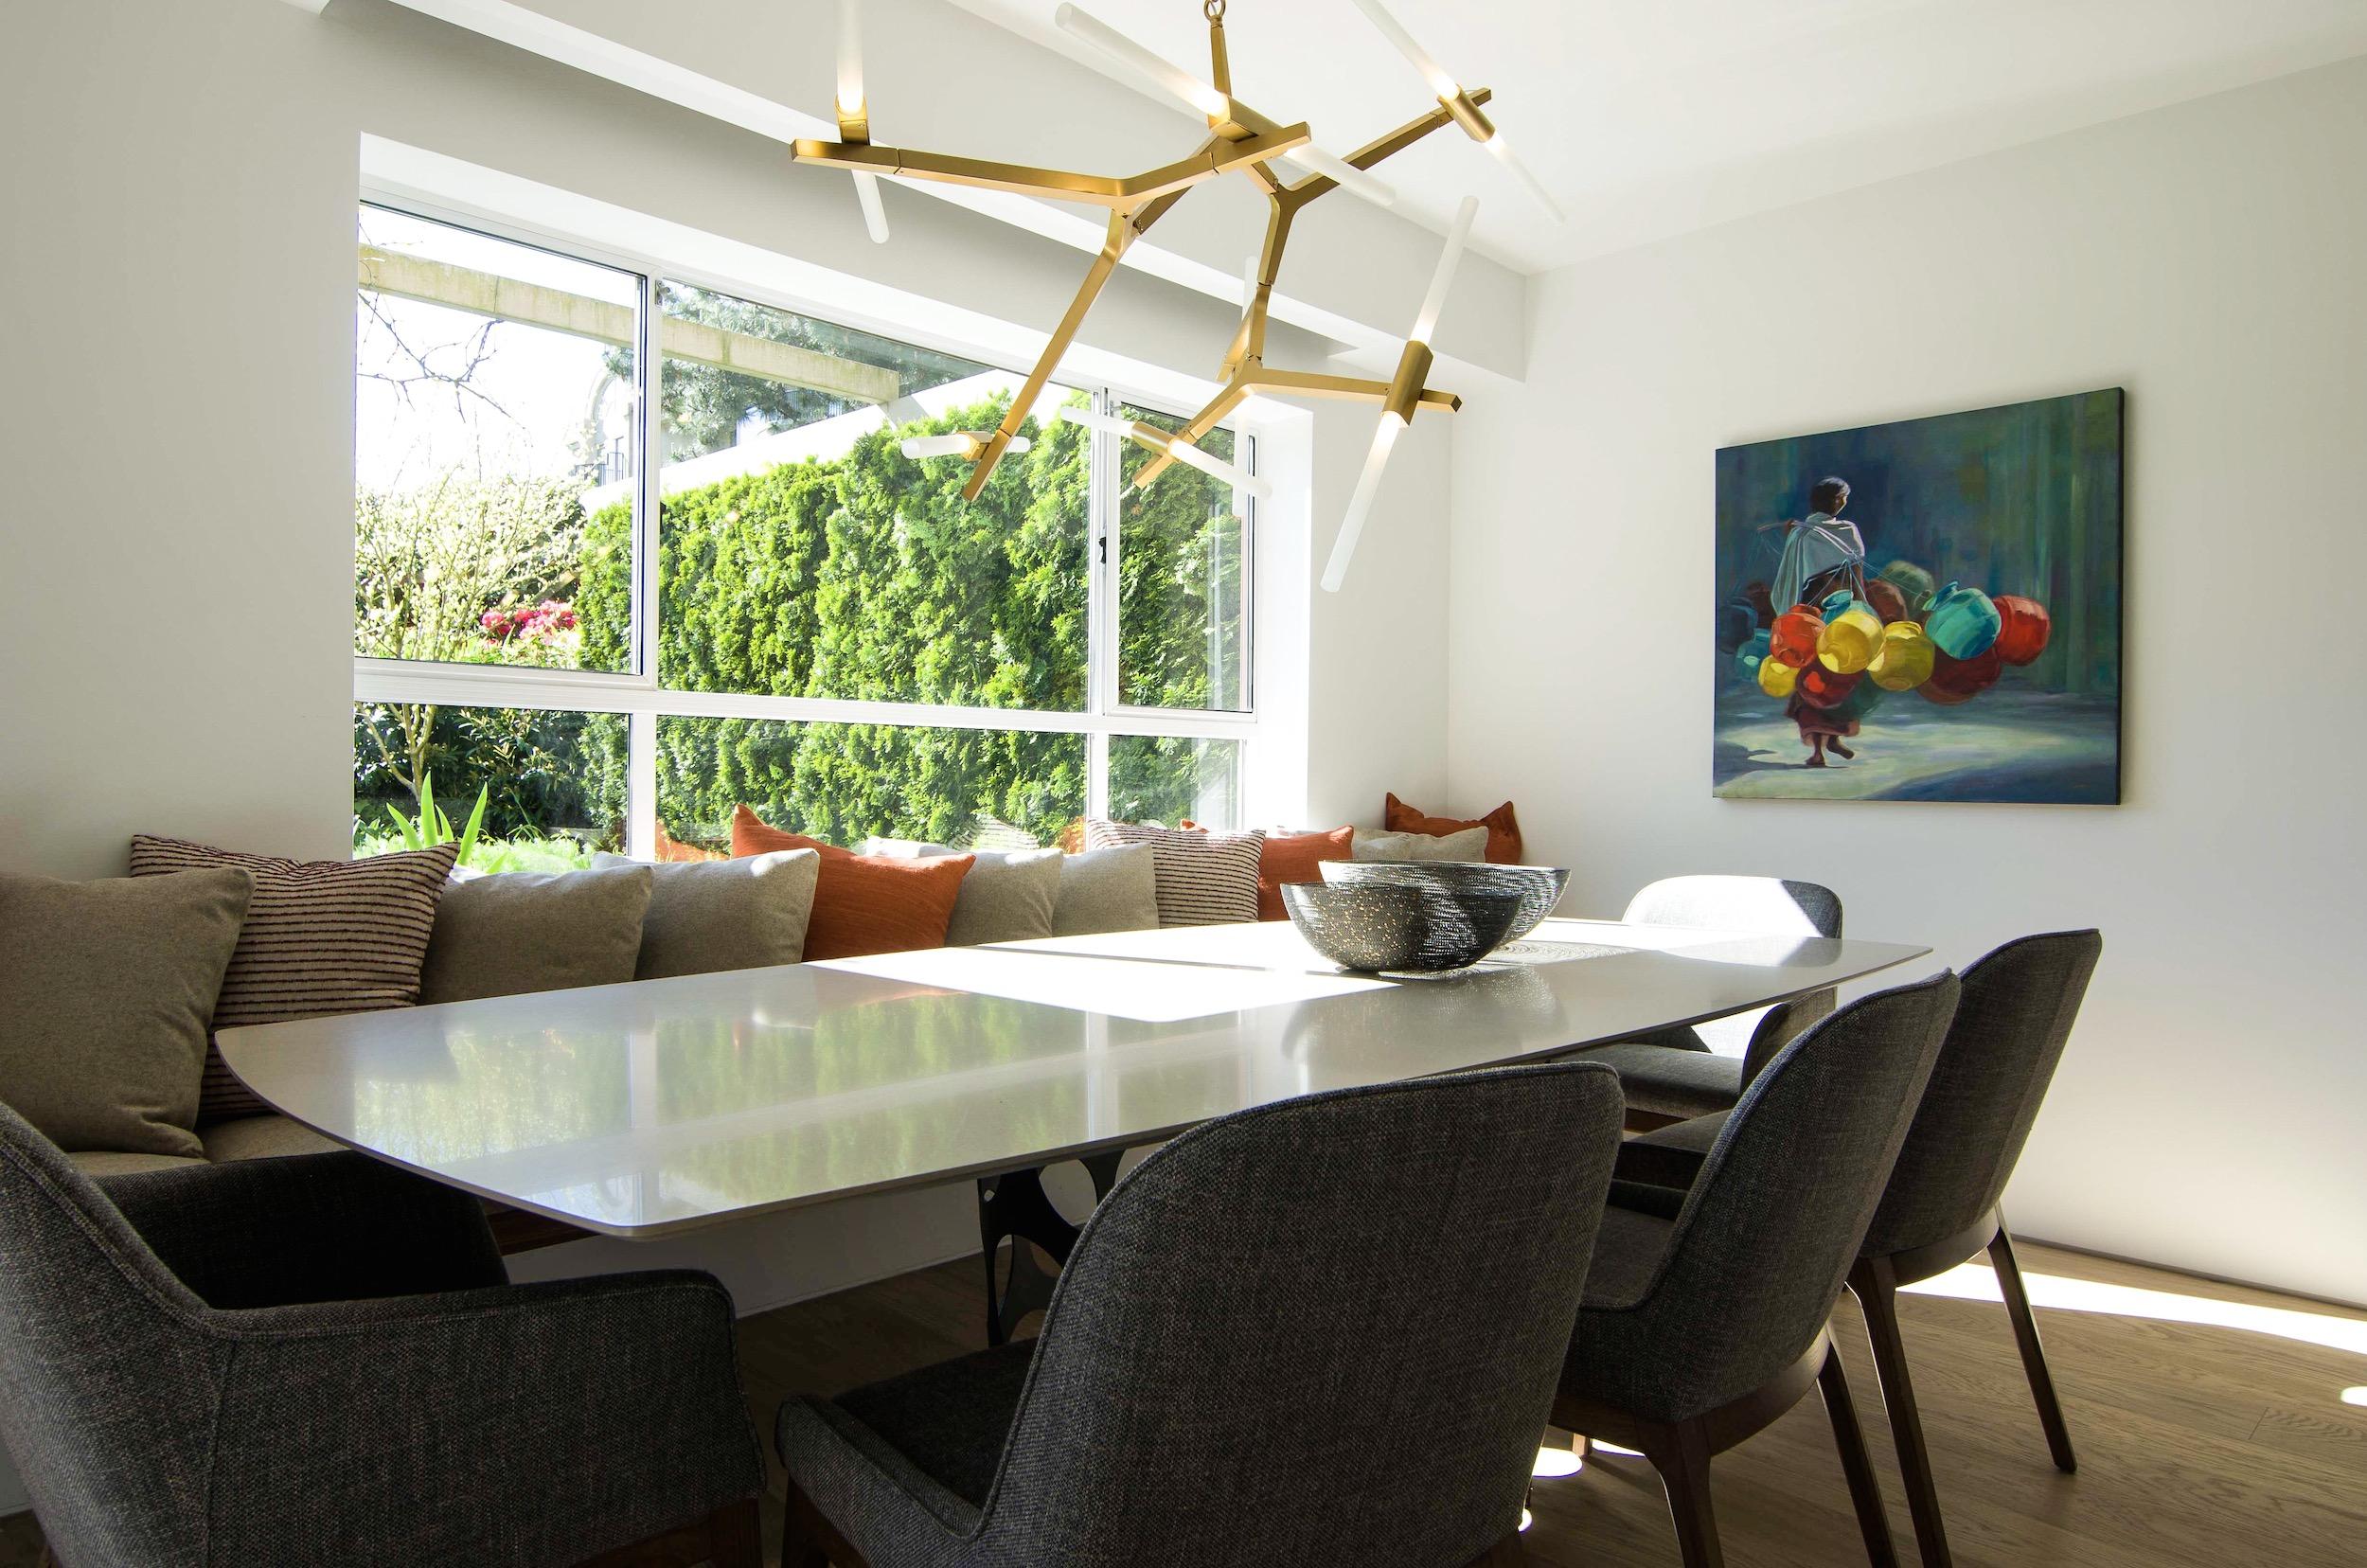 KRC_Spyglass_Dining_Room_1.JPG.JPG